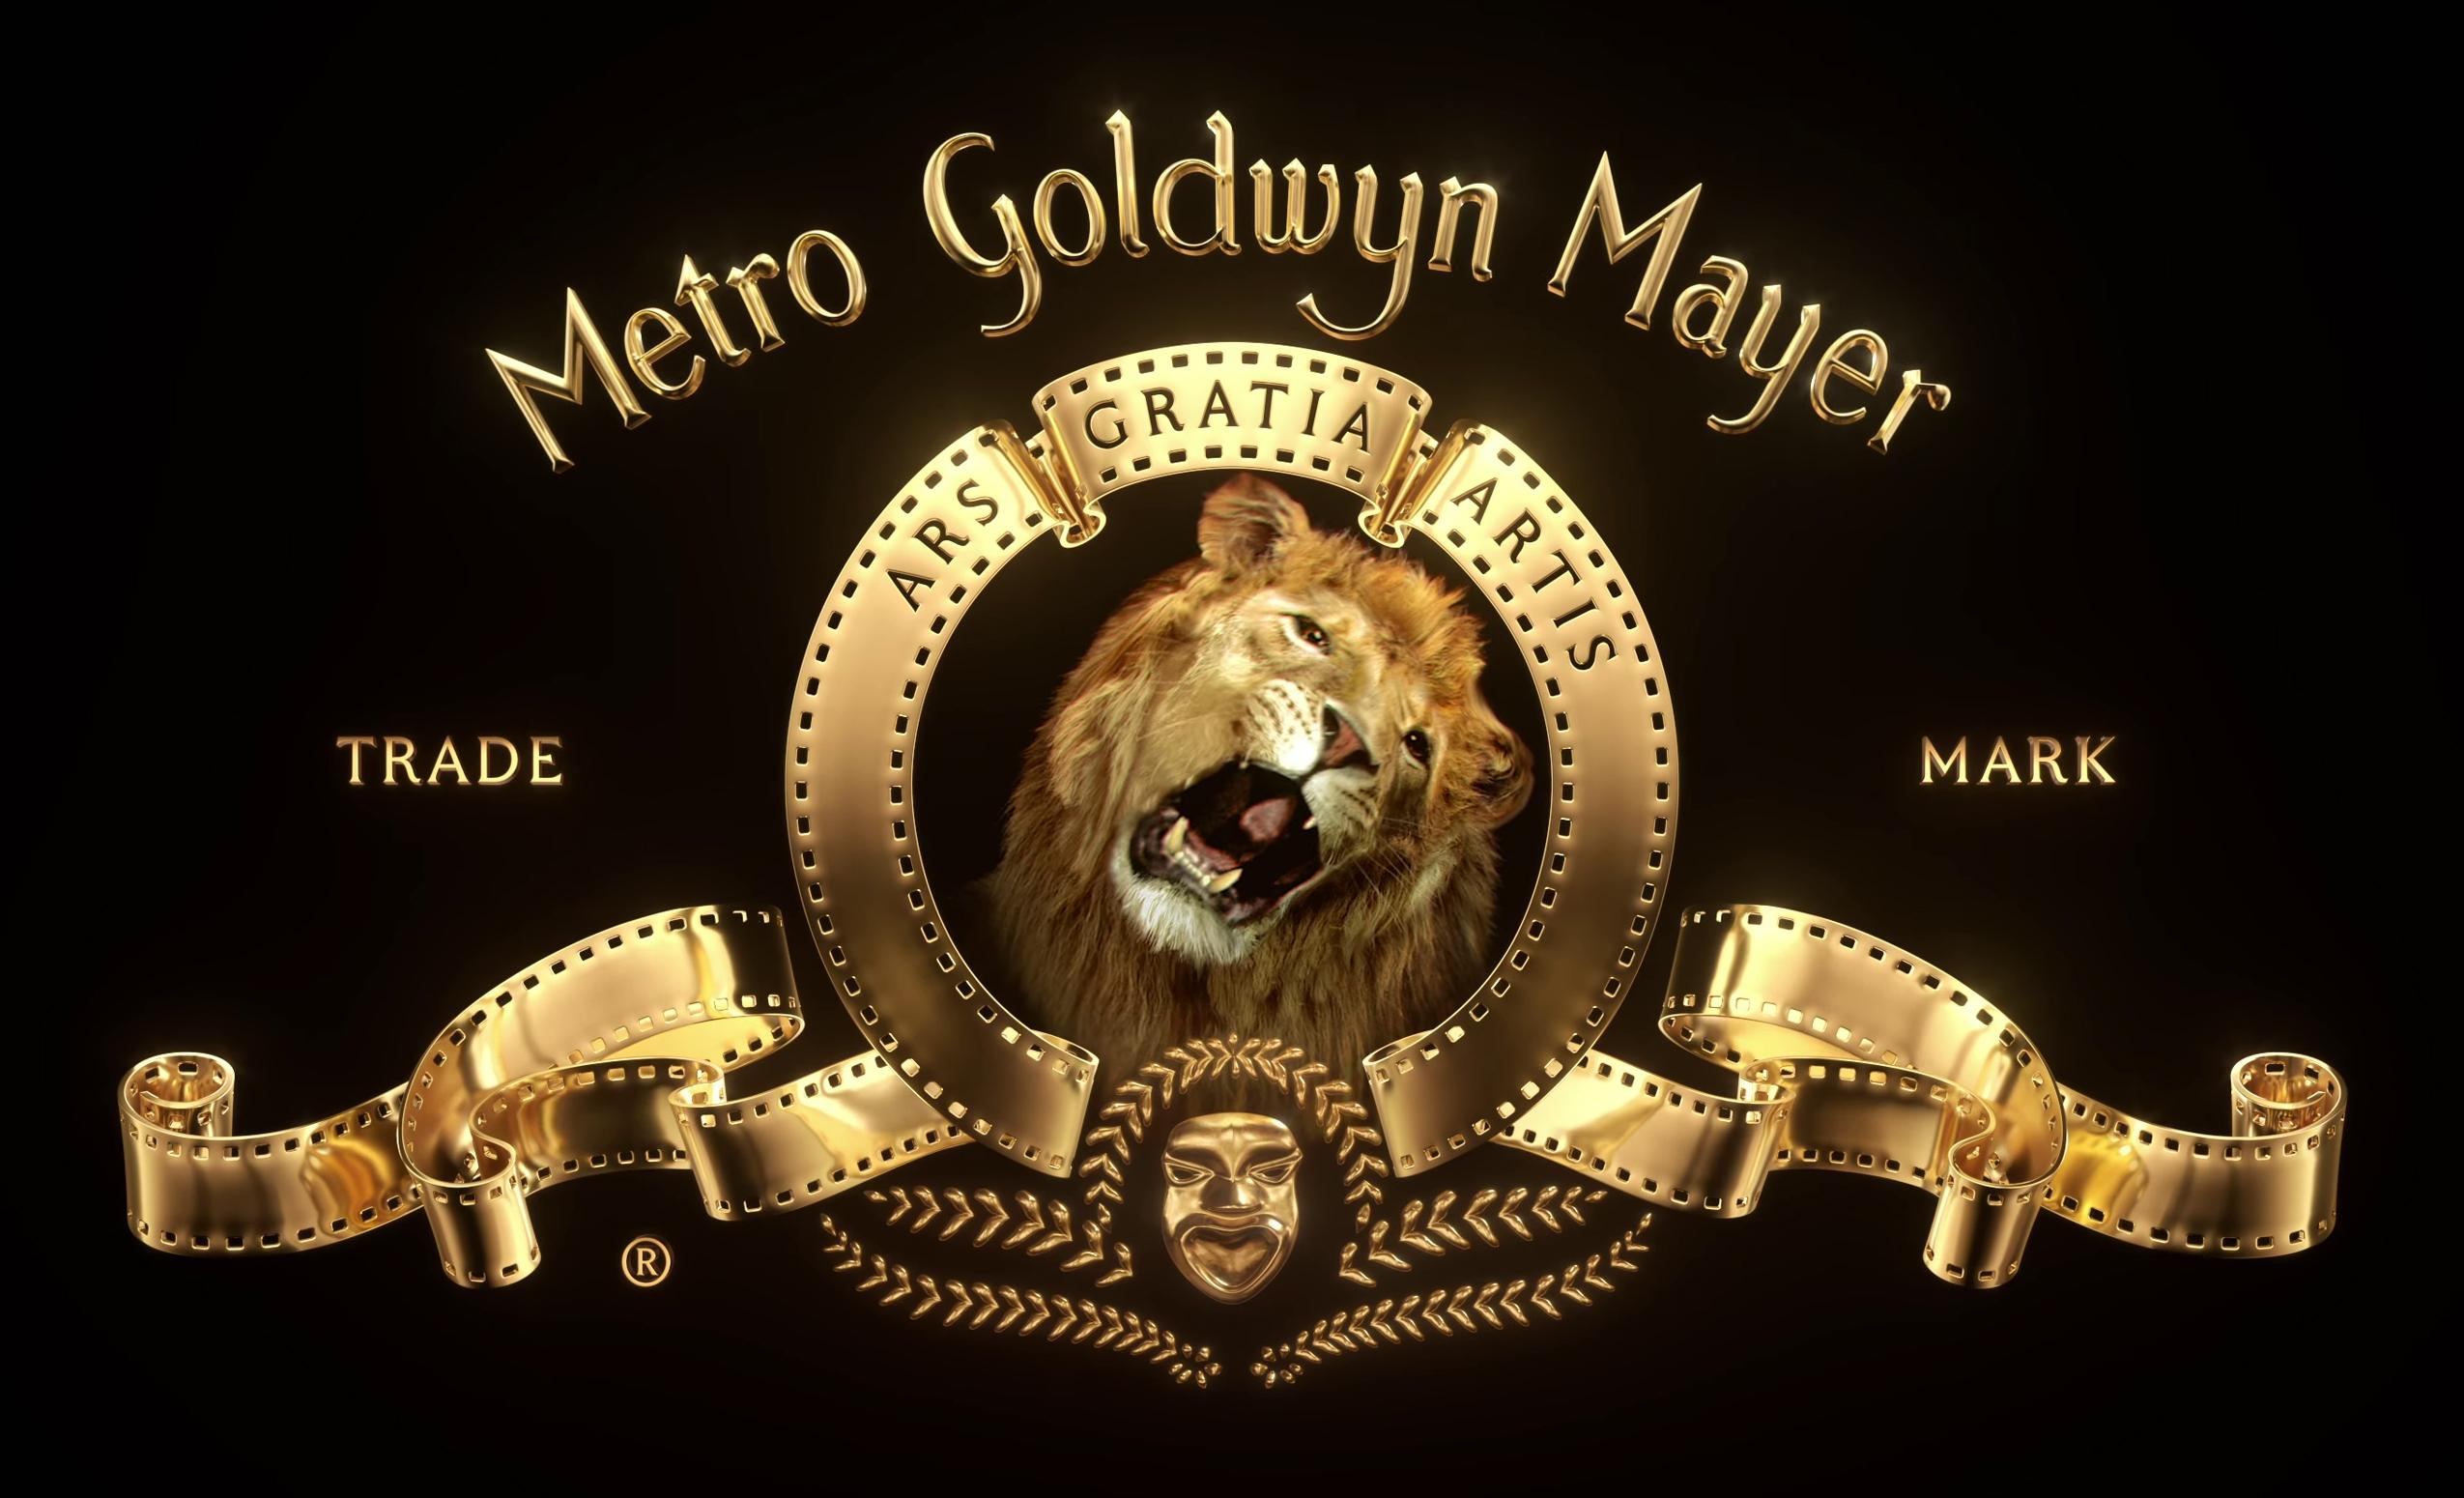 © Metro-Goldwyn-Mayer